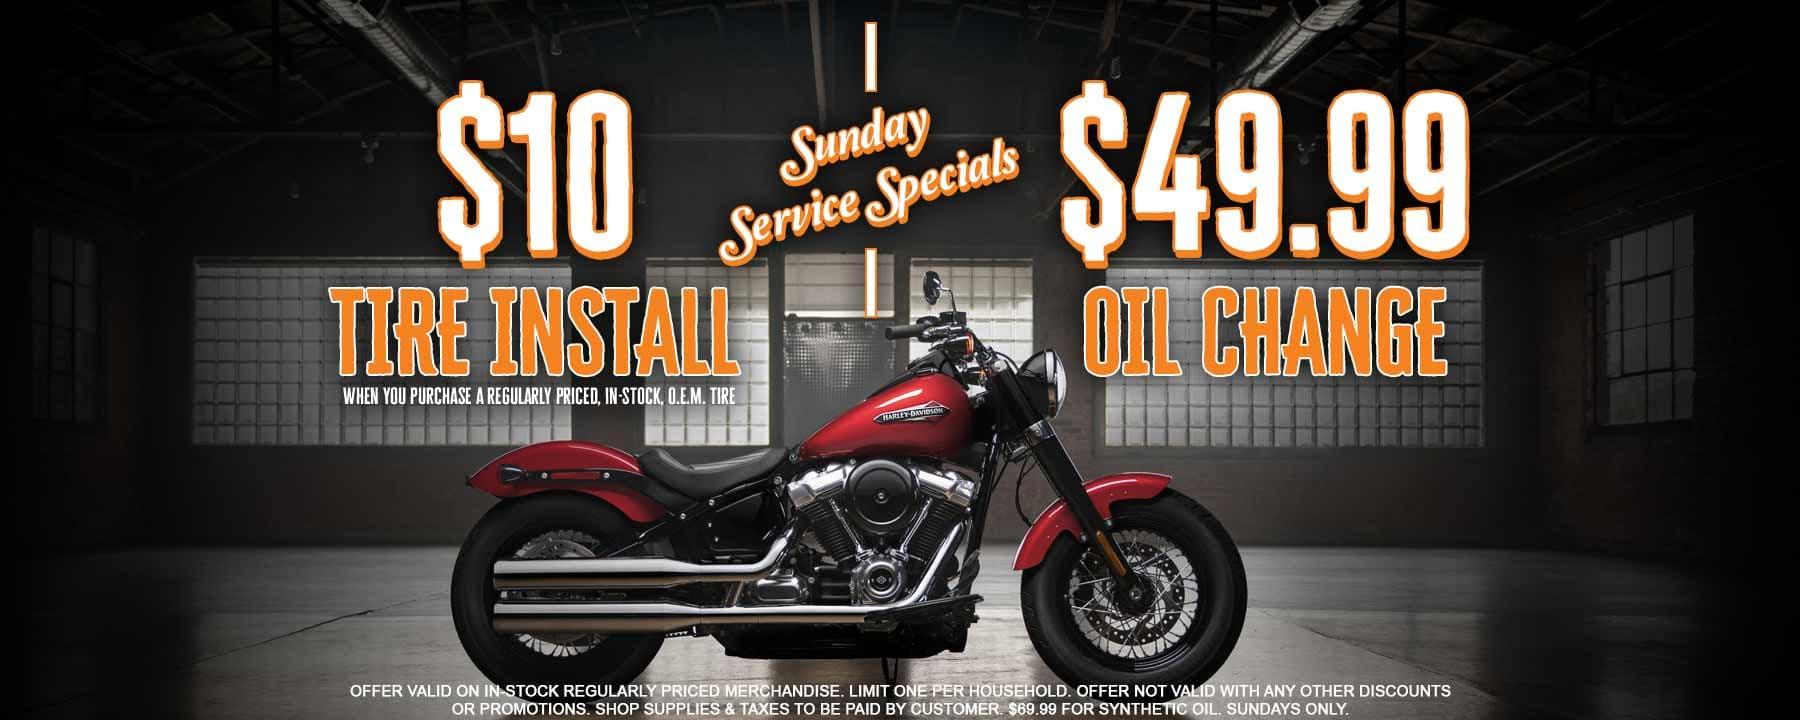 Harley-Davidson Service Coupons